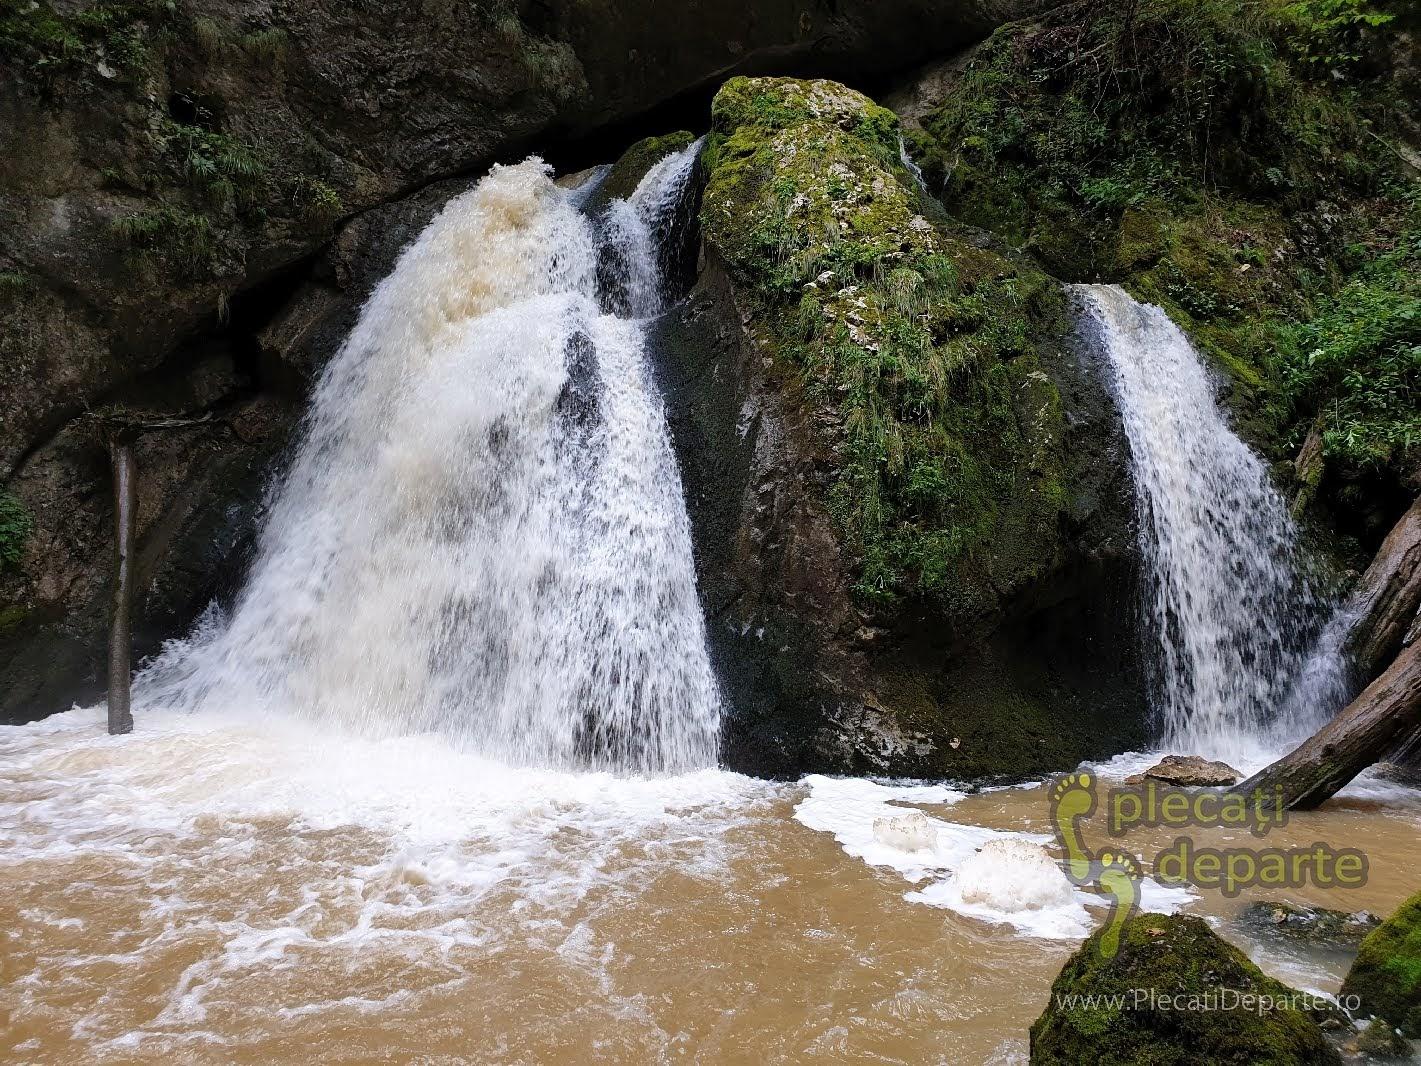 Cascada Evantai Apuseni, Cascada Evantai Padis, in Cheile Galbenei, Circuitul Cheile Galbenei, trasee padis apuseni, parcul natural apuseni obiective turitice,